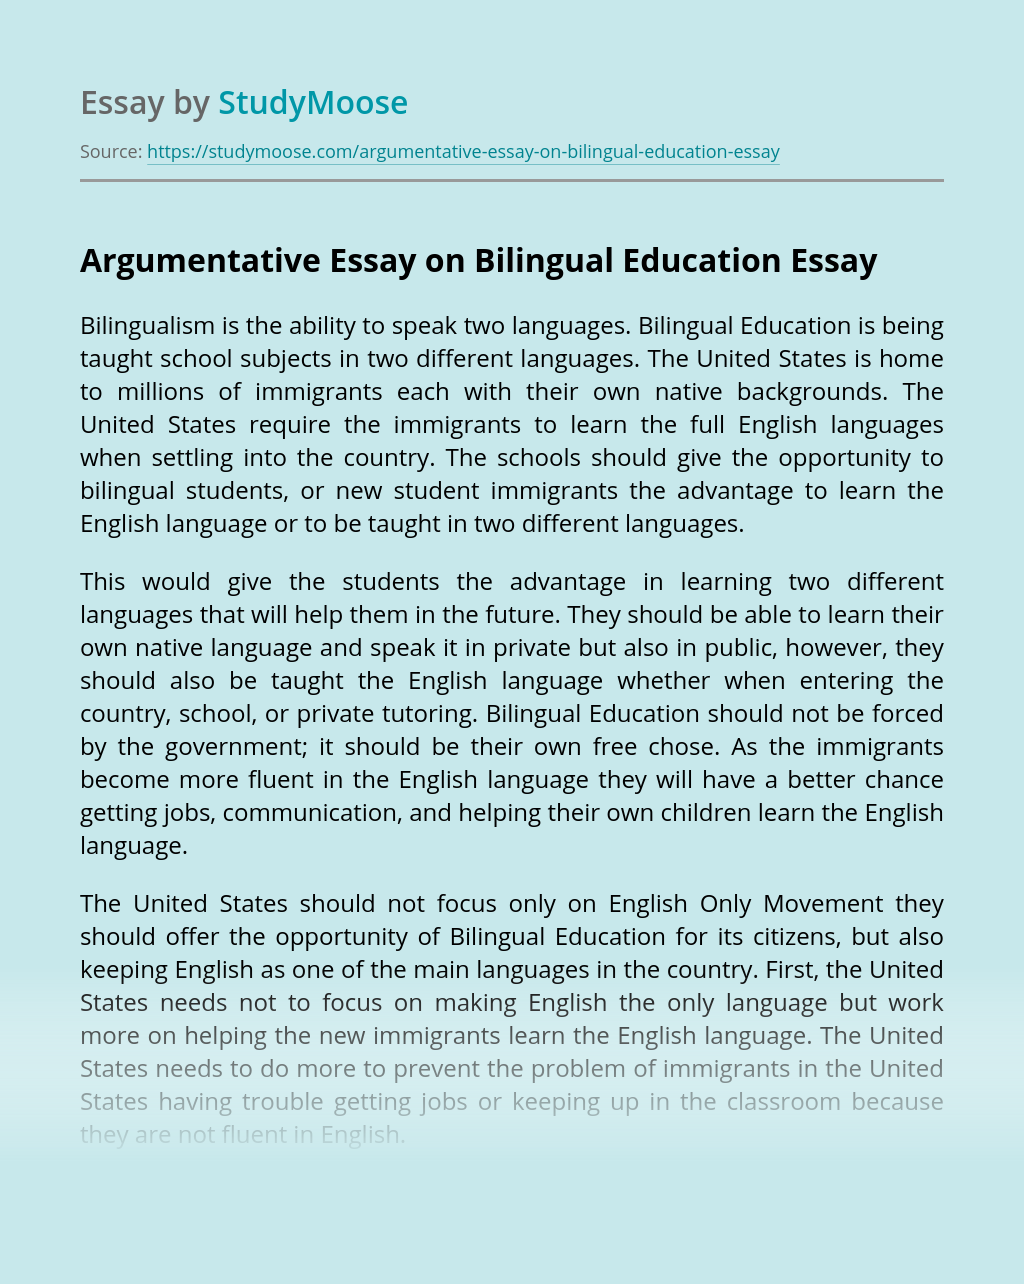 Argumentative Essay on Bilingual Education